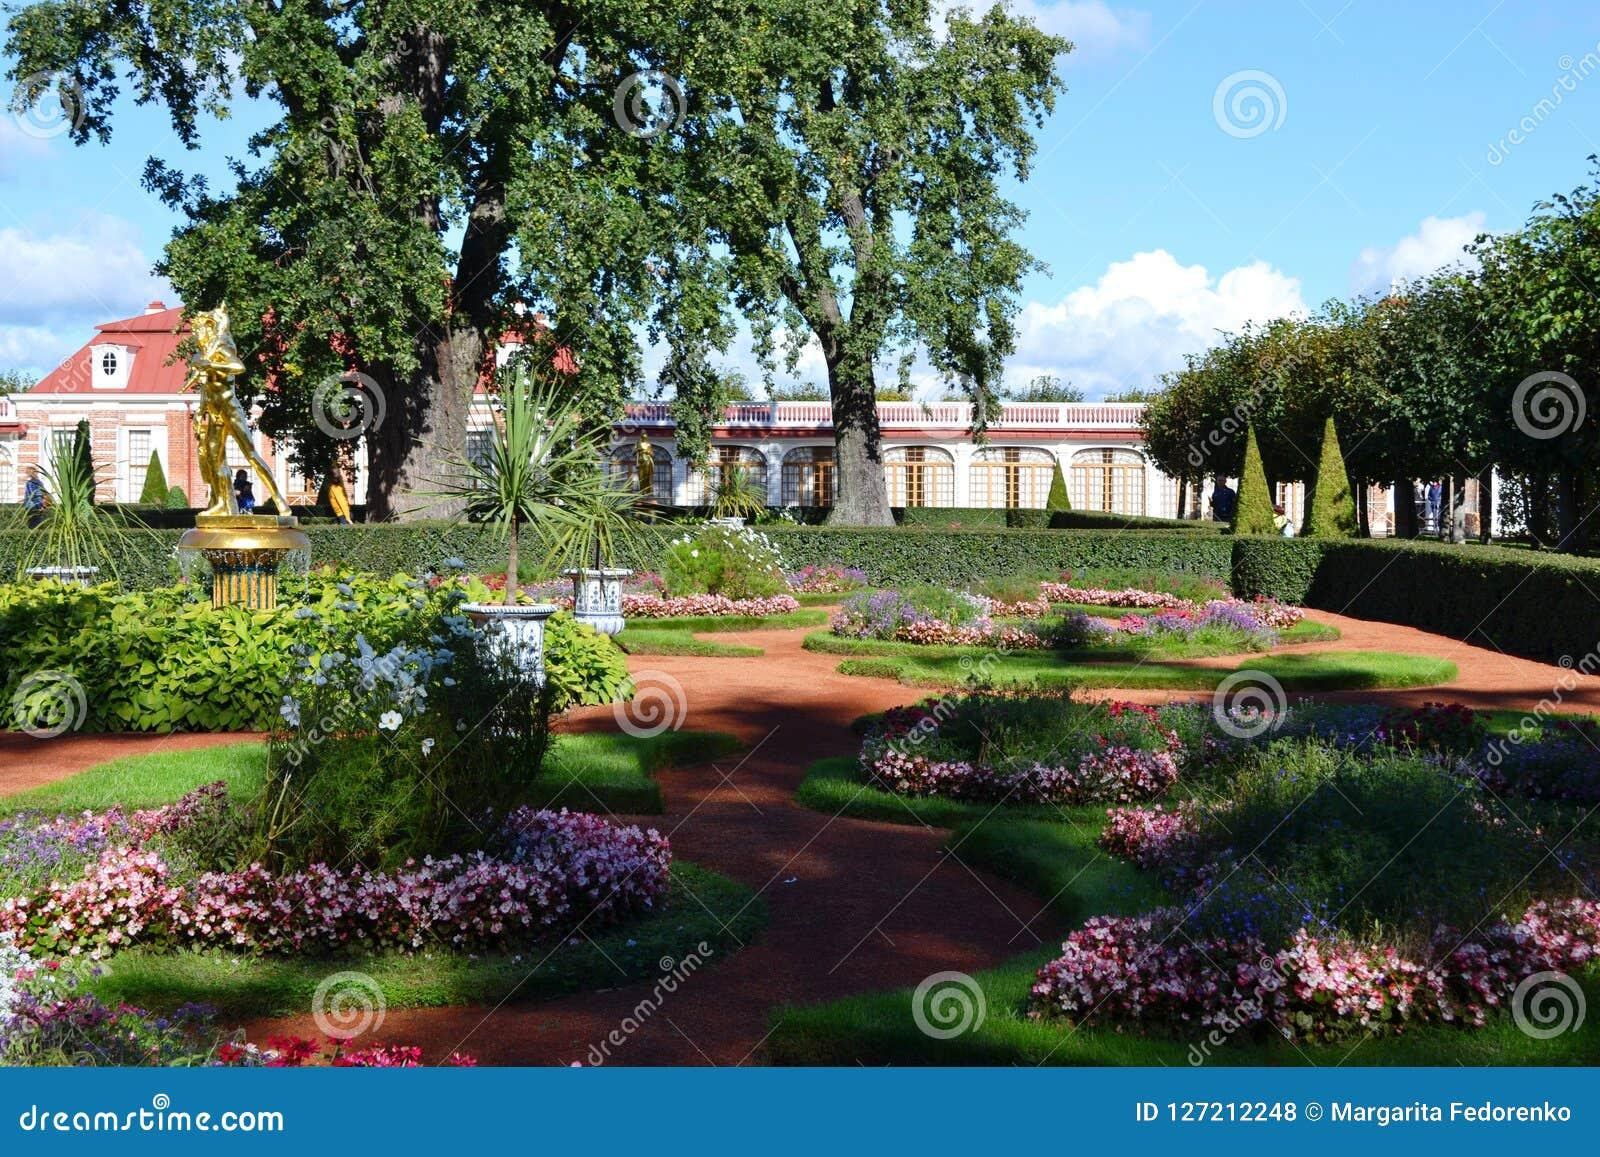 Territory of the Park ensemble Peterhof in Saint Petersburg